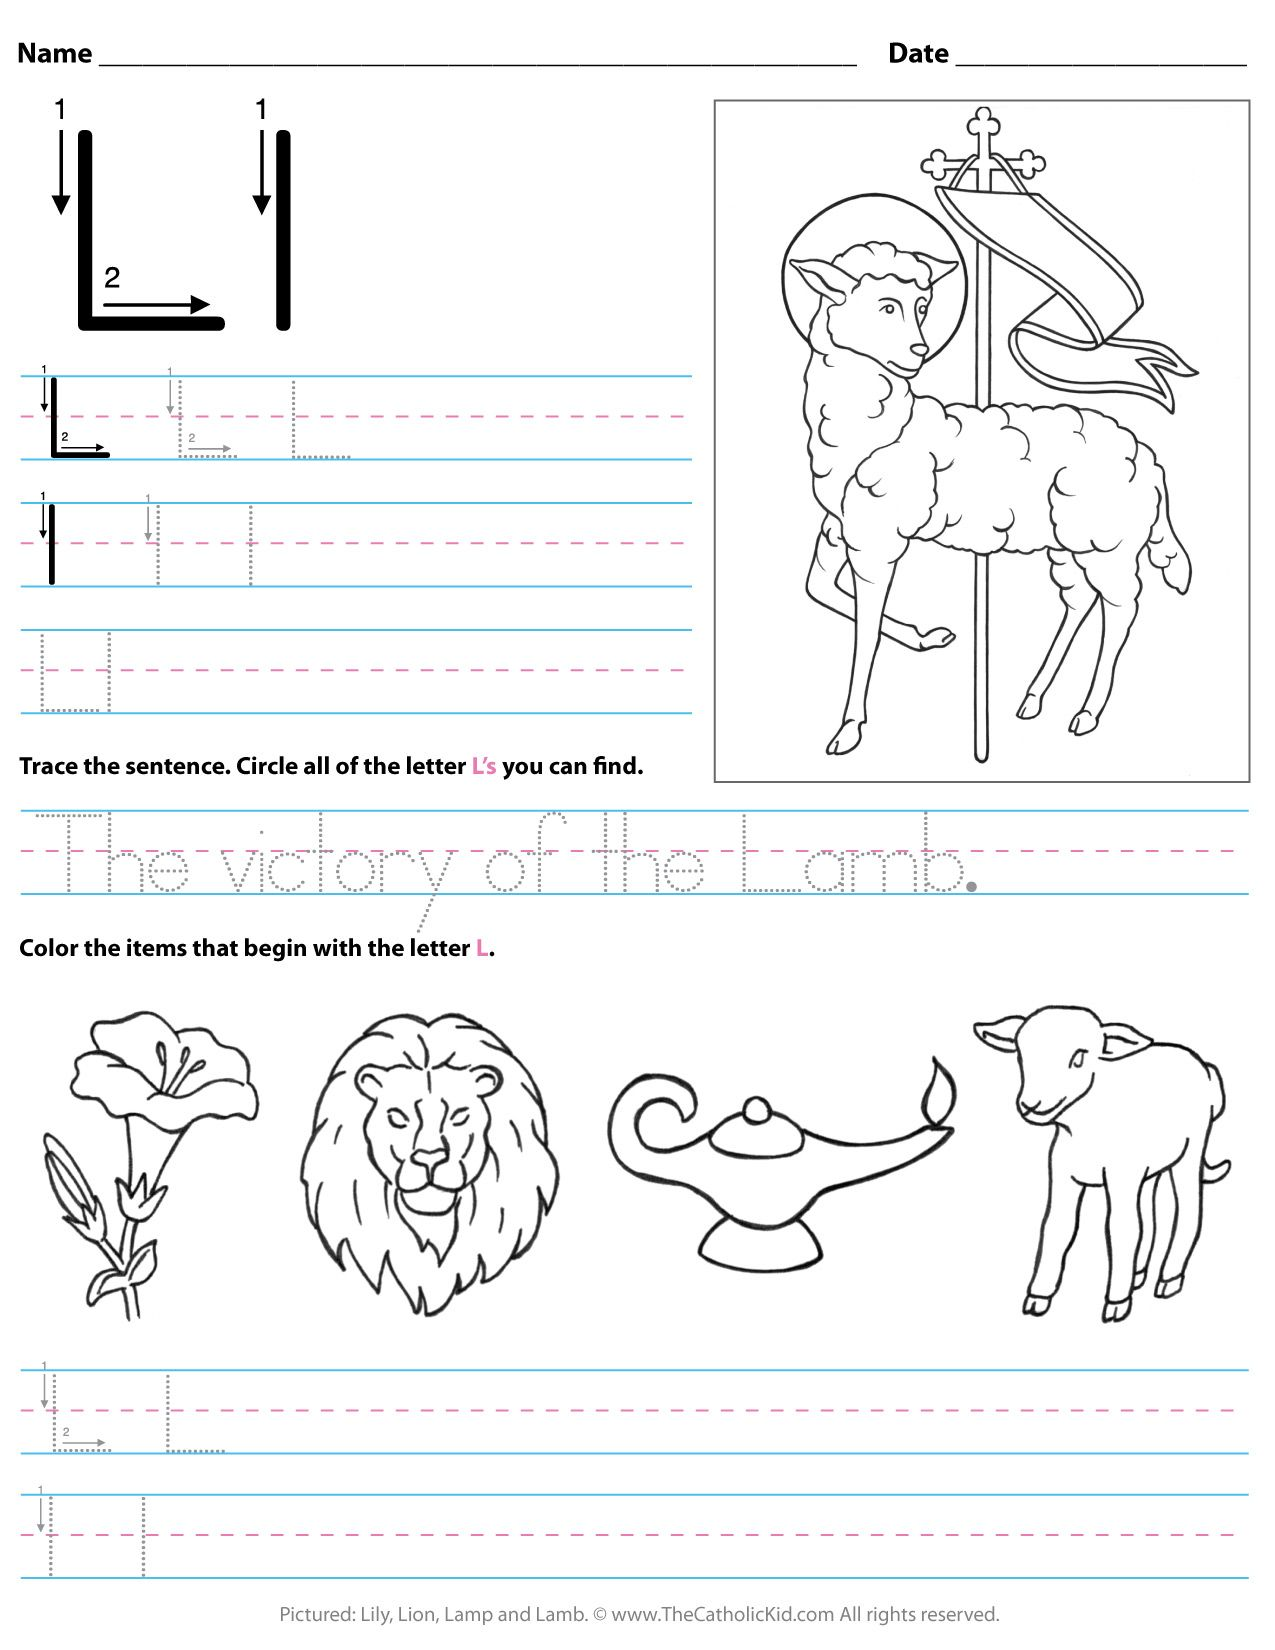 Catholic Alphabet Letter L Worksheet Preschool Kindergarten Thecatholickid Com Letter Worksheets For Preschool Letter L Worksheets Preschool Letters [ 1650 x 1275 Pixel ]